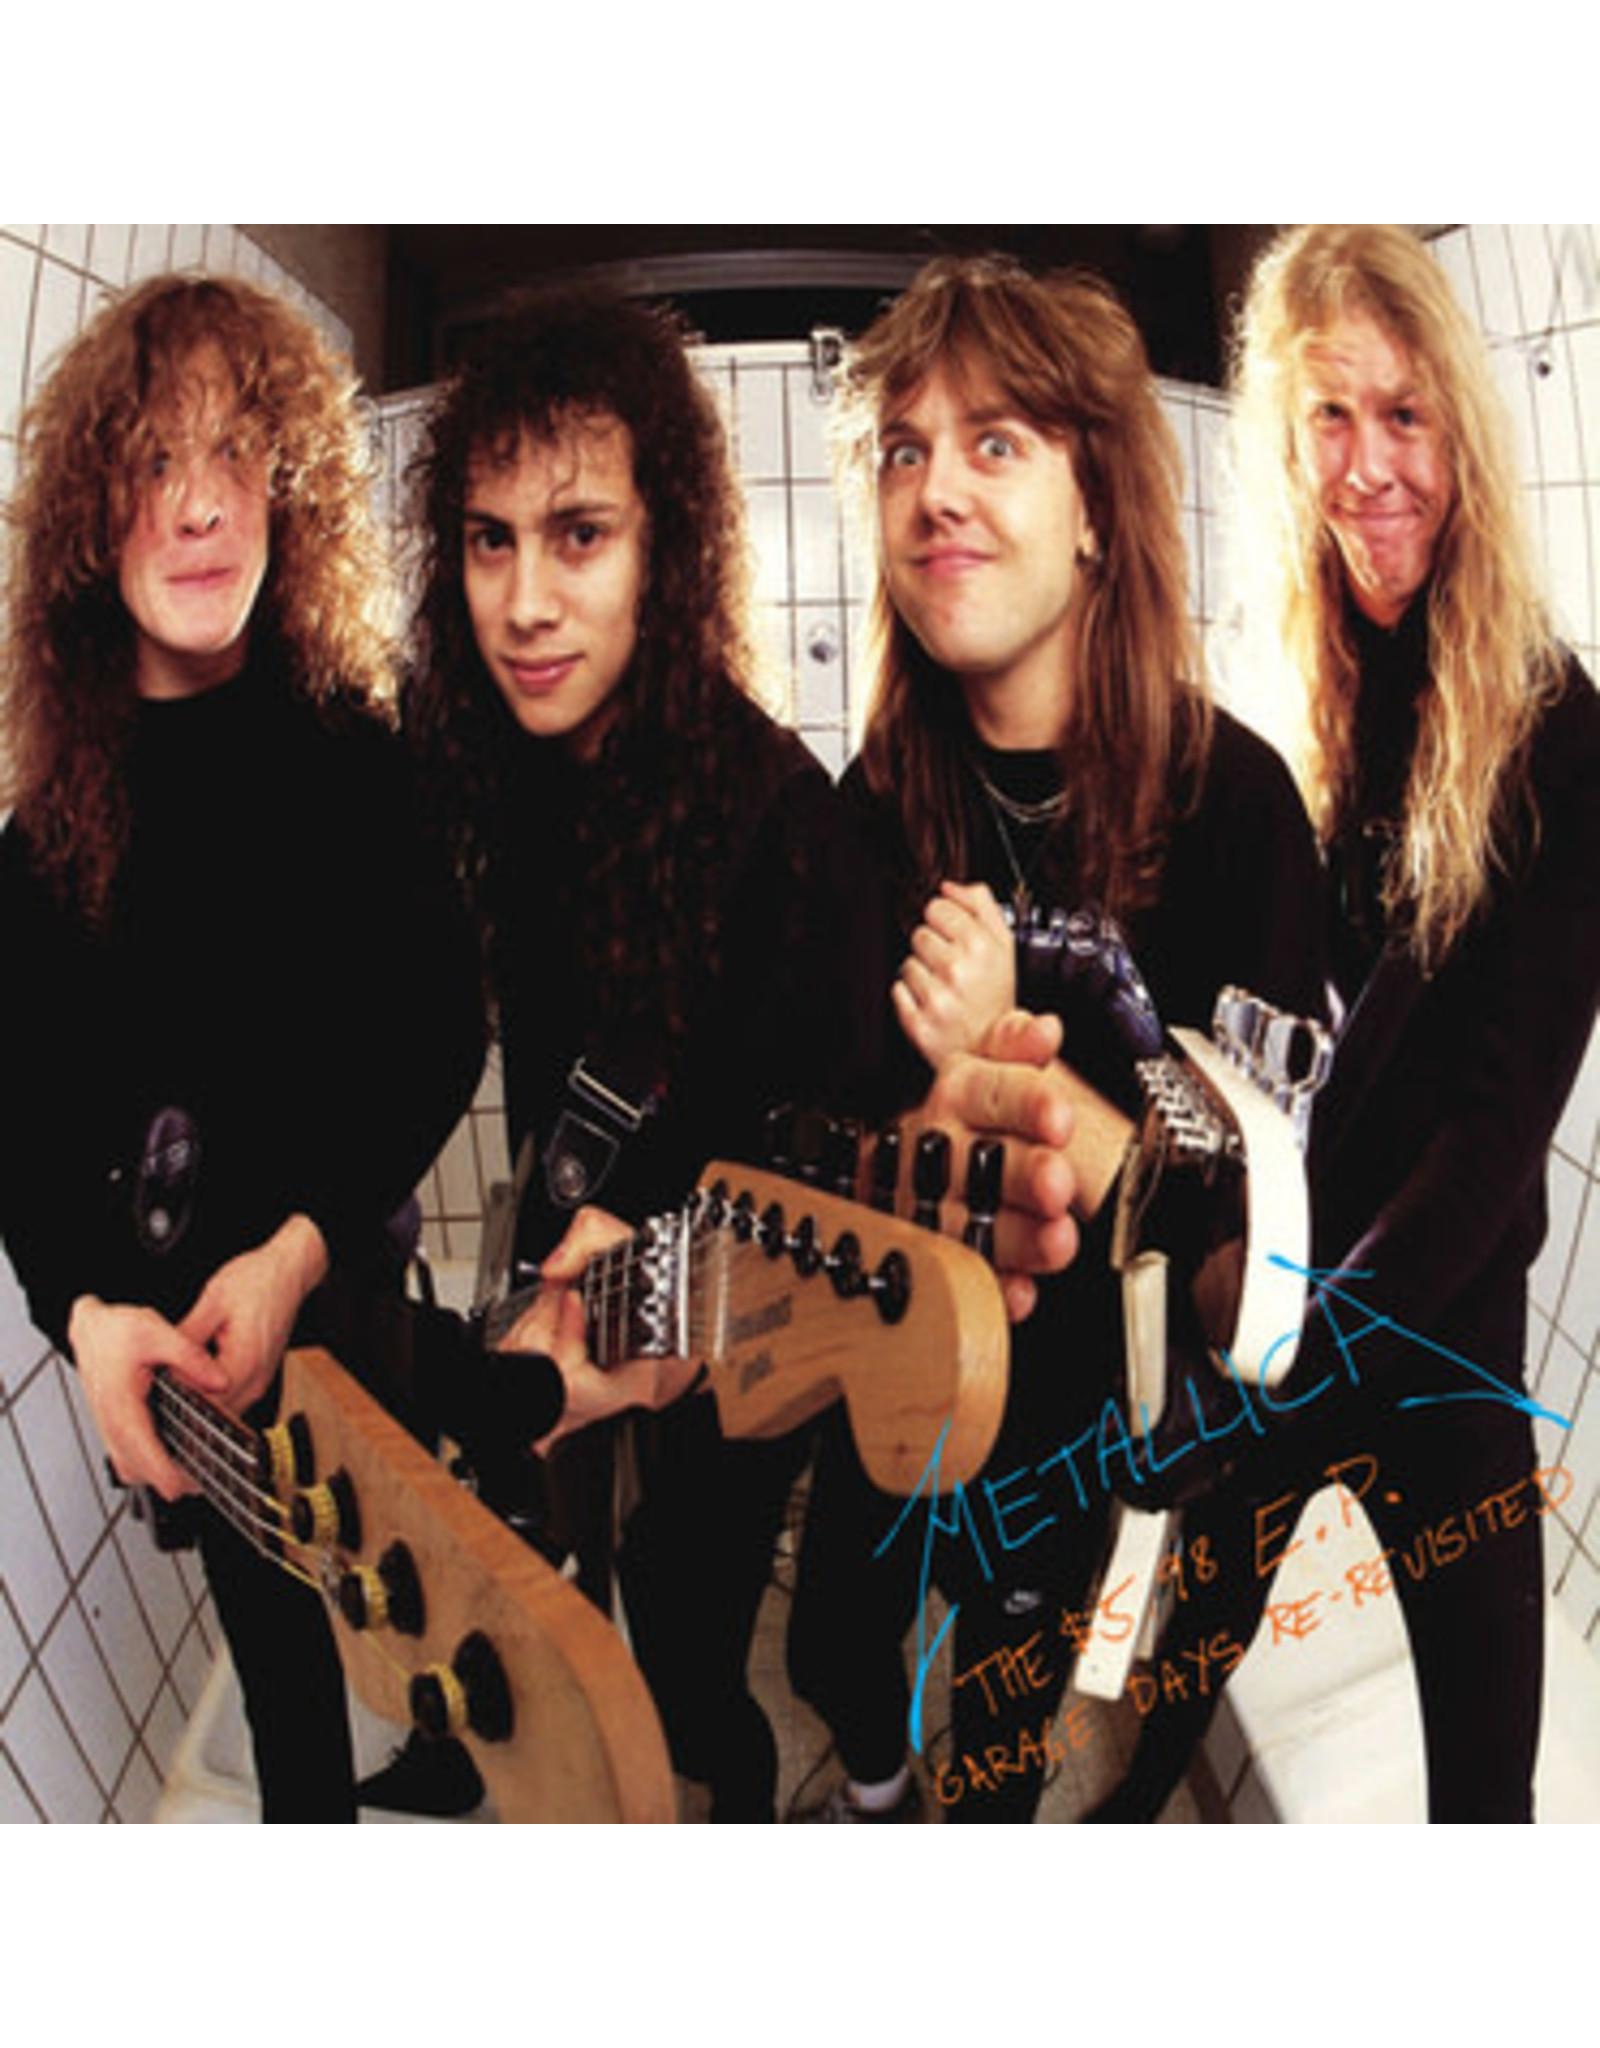 Blackened Metallica: The $5.98 Ep - Garage Days LP